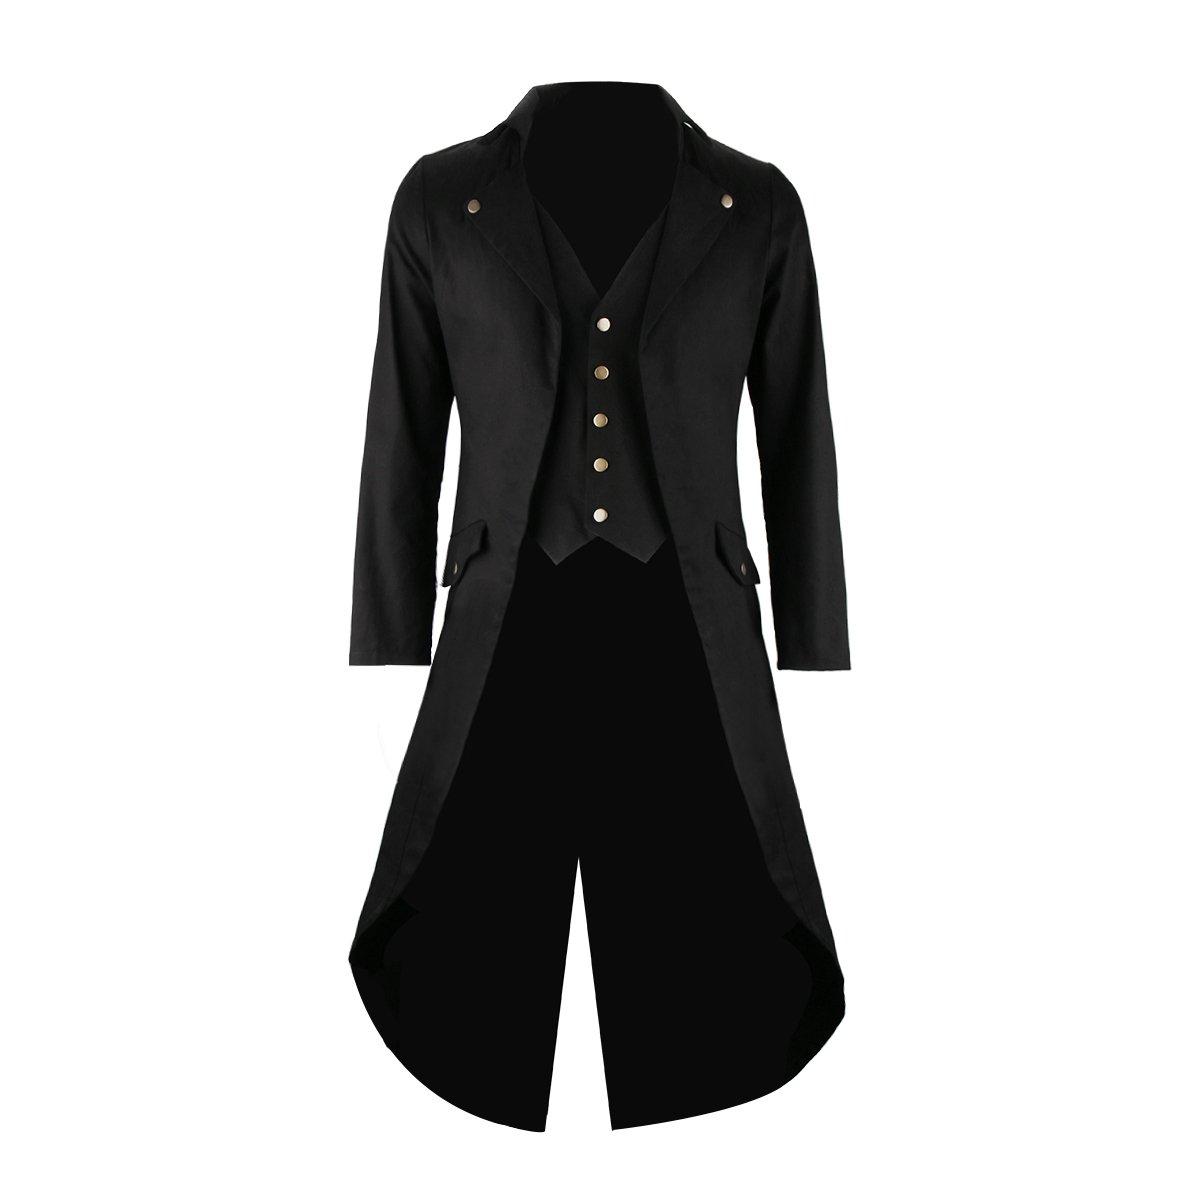 Mens Gothic Tailcoat Tuxedo Jacket Black Steampunk VTG Victorian Costume Long Frock Coat (Small)